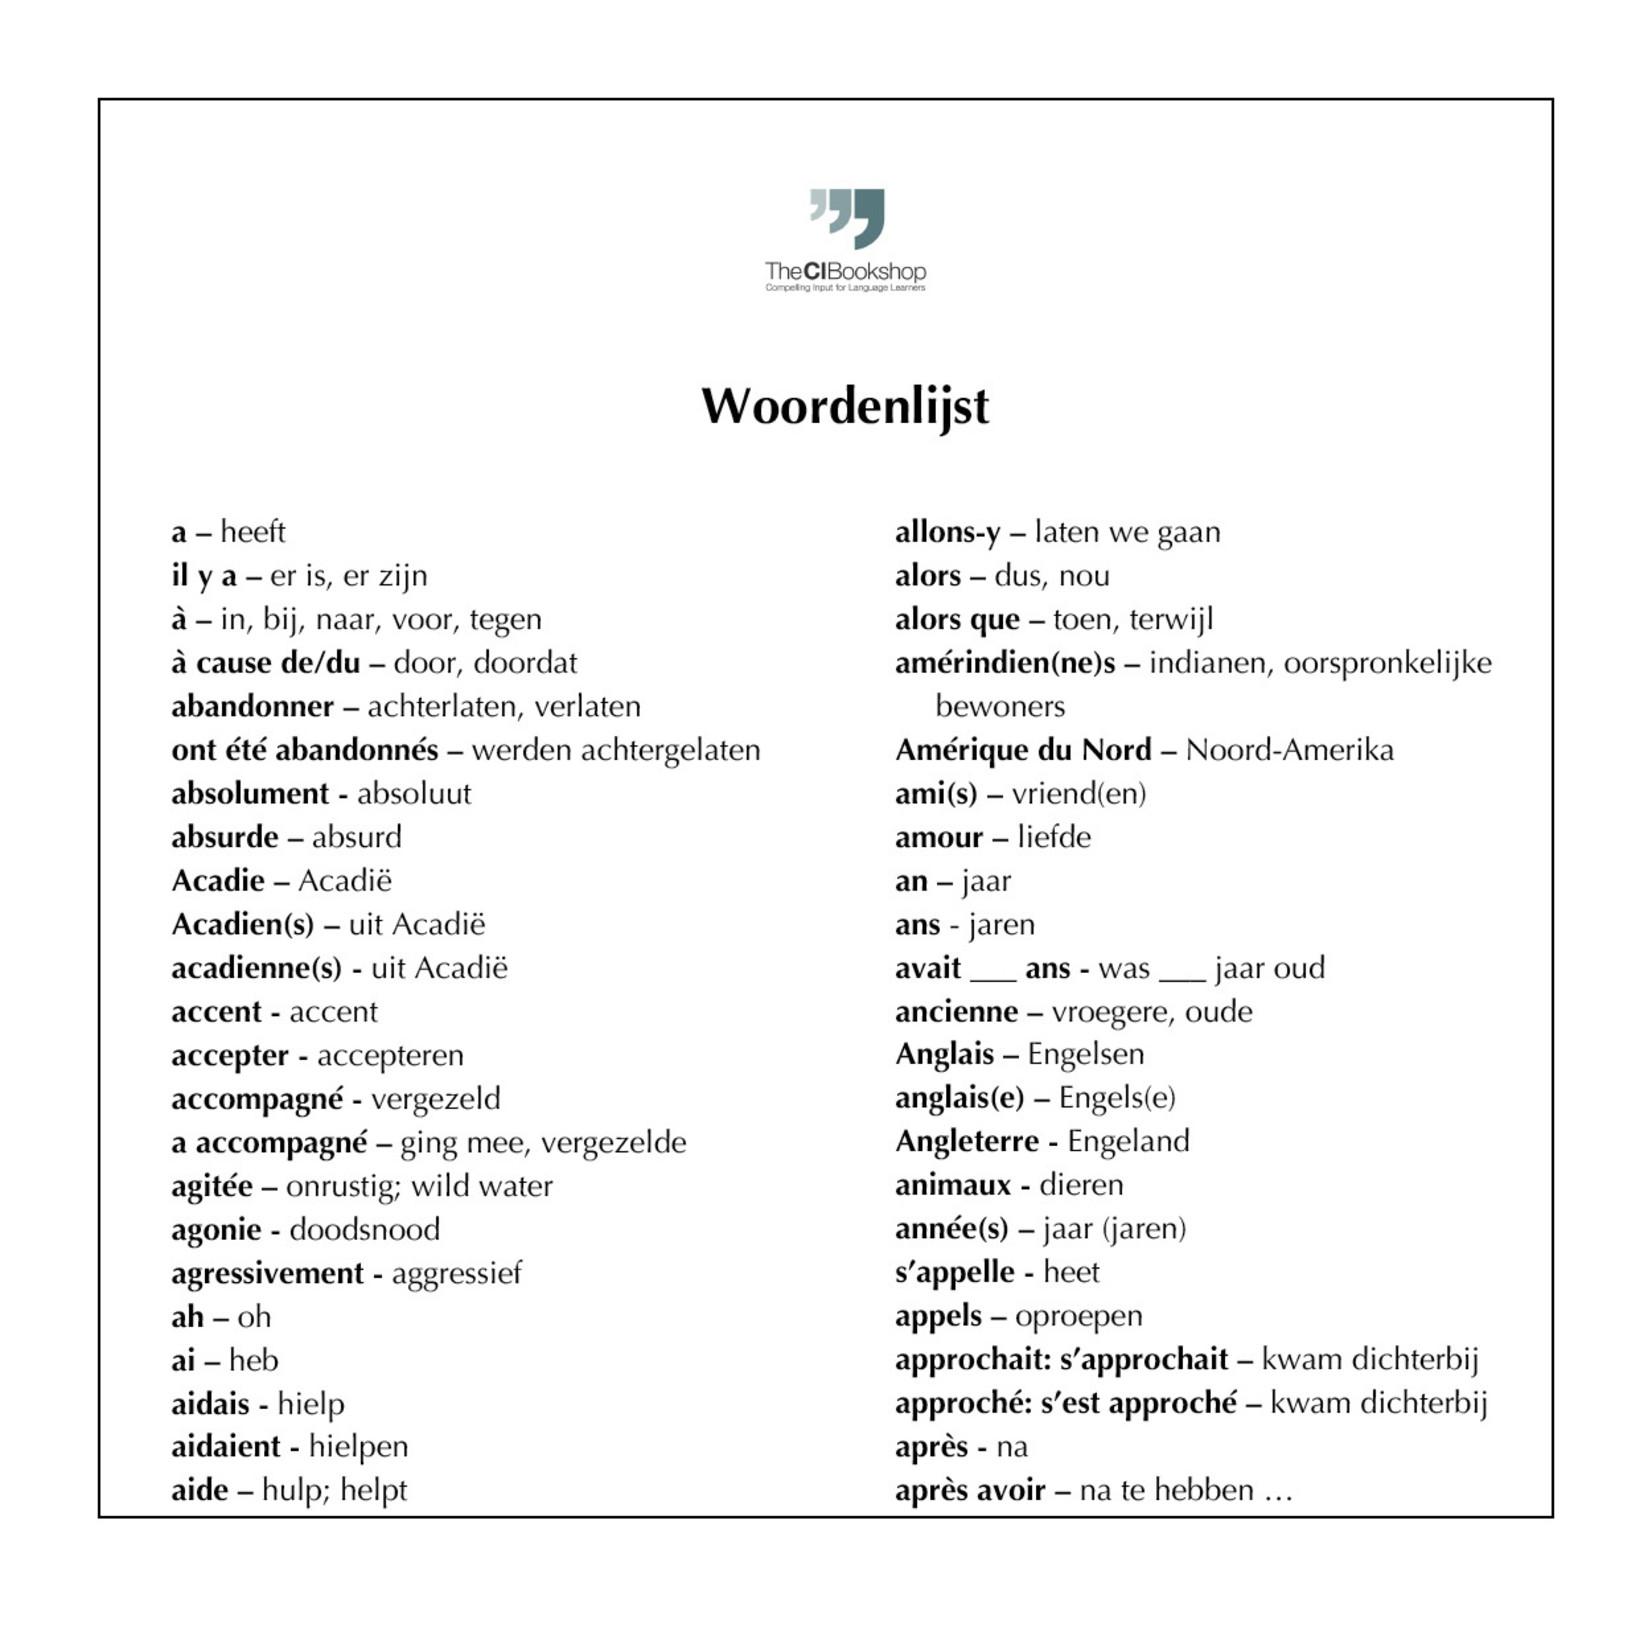 Dutch glossary for La nouvelle fille